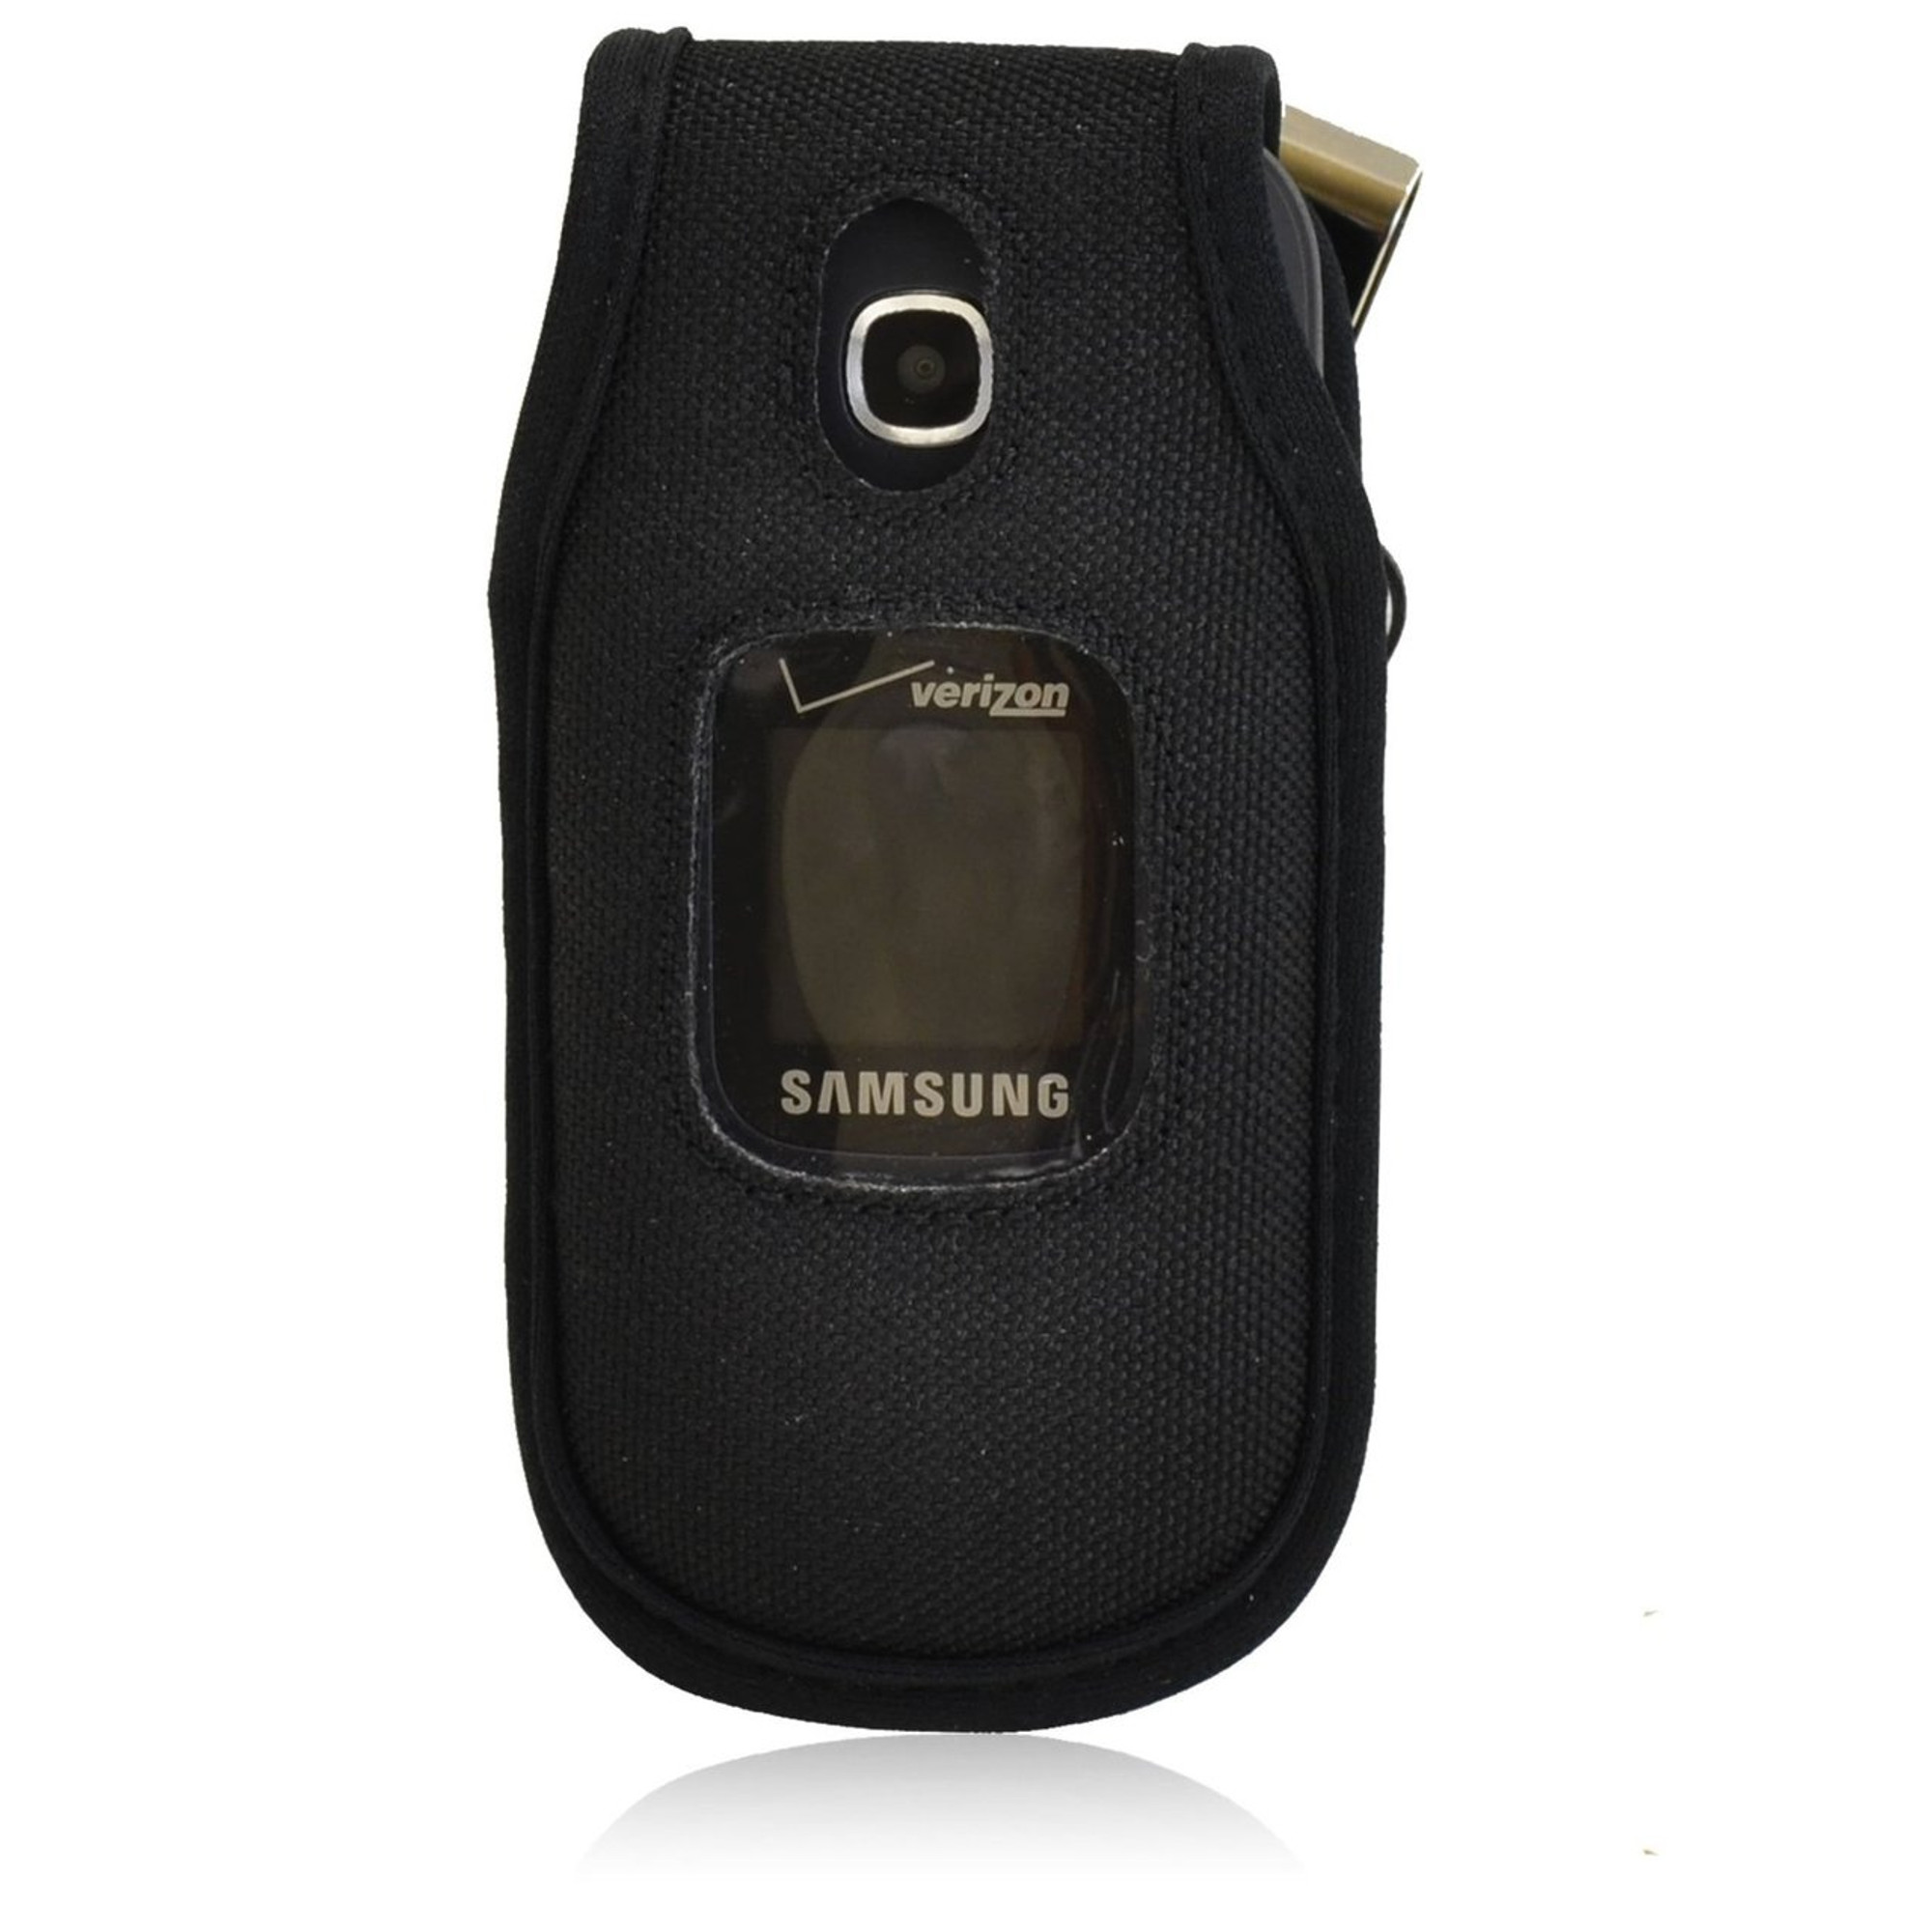 samsung gusto 3 heavy duty nylon flip phone case with removable rh turtlebackcase com Samsung Gusto 2 Owners Manual Samsung Gusto 2 Phone Manual